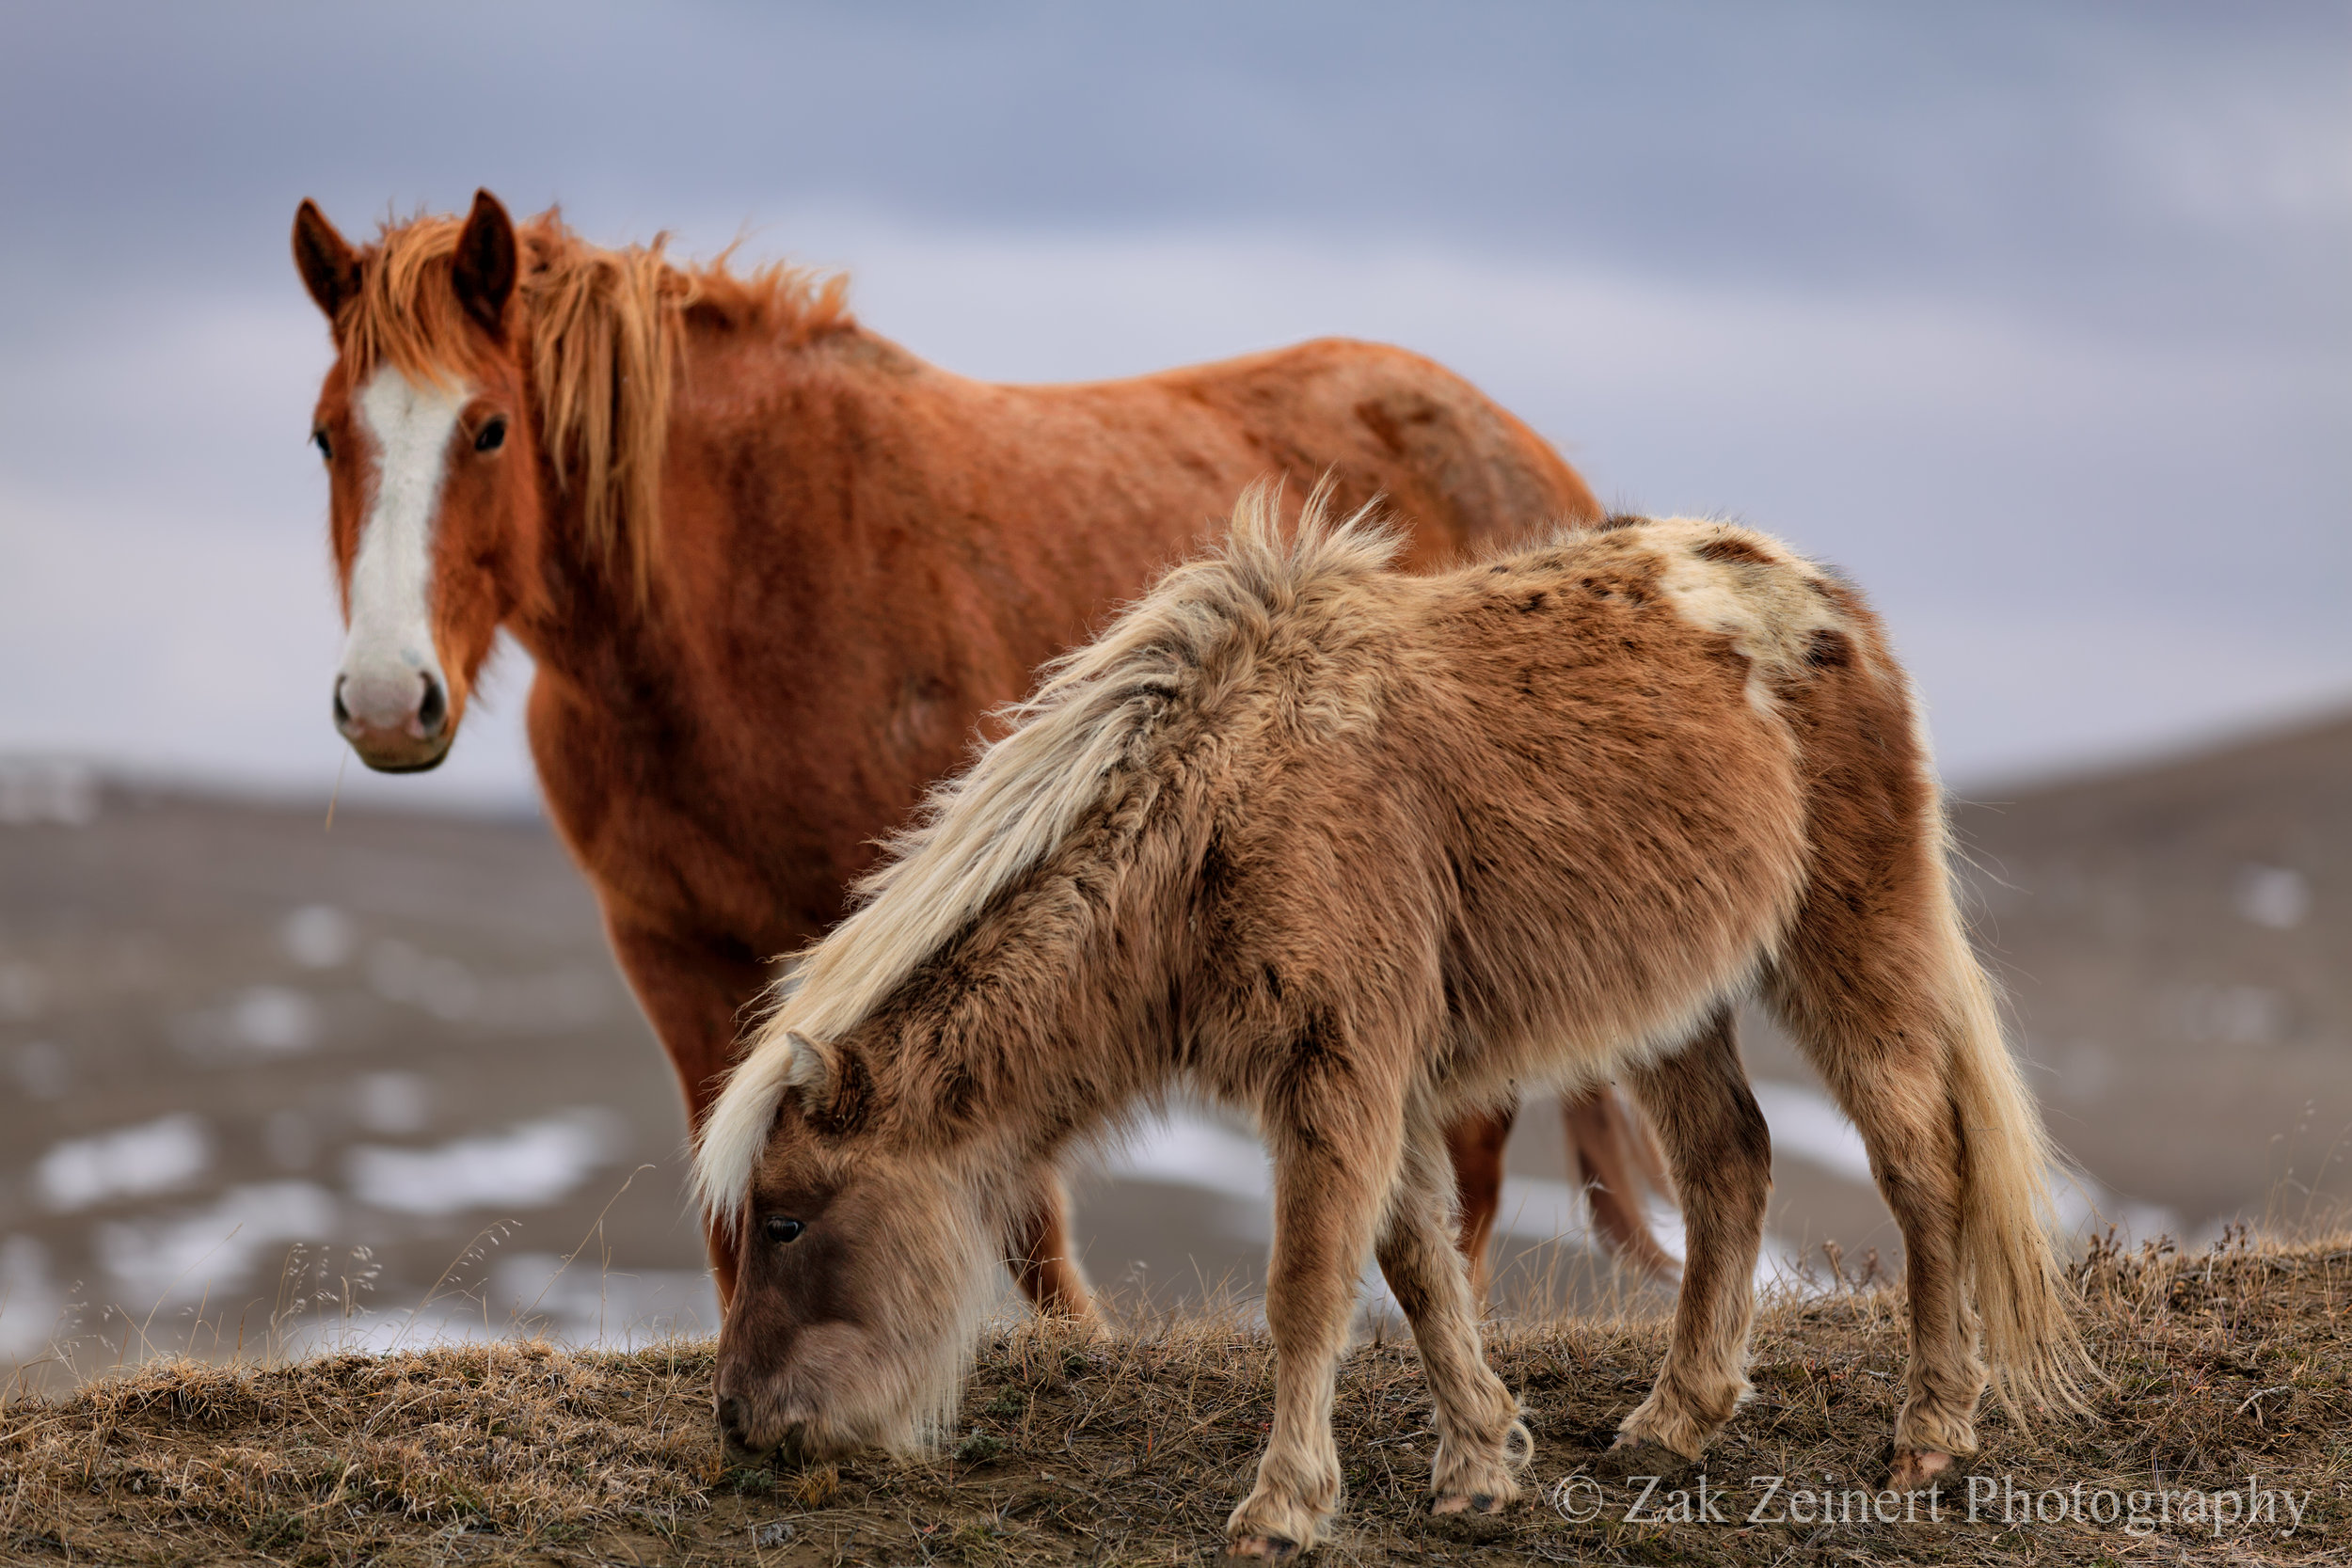 Wild Horses near Little Big horn